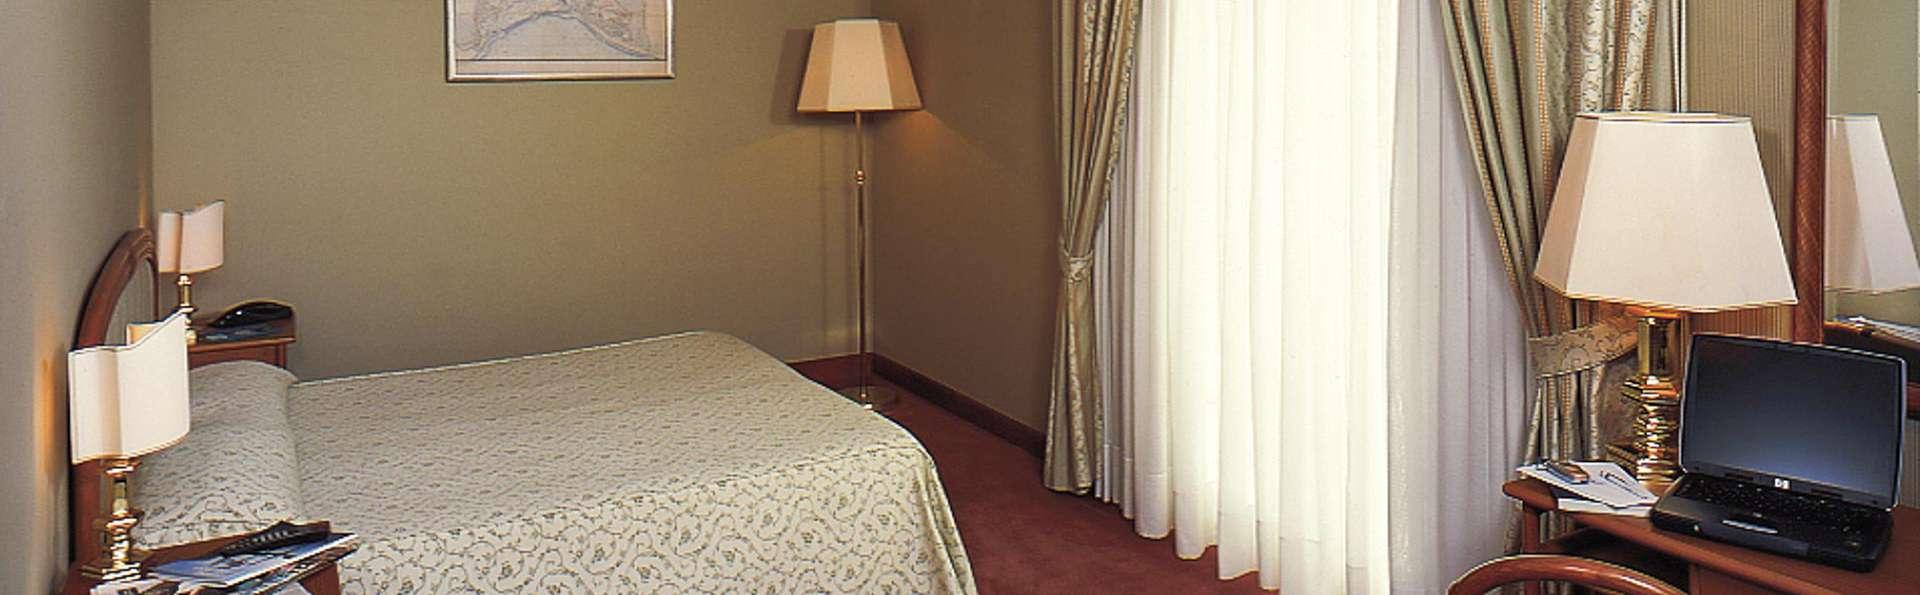 Hotel Santa Chiara ****  - EDIT_ROOM_02.jpg